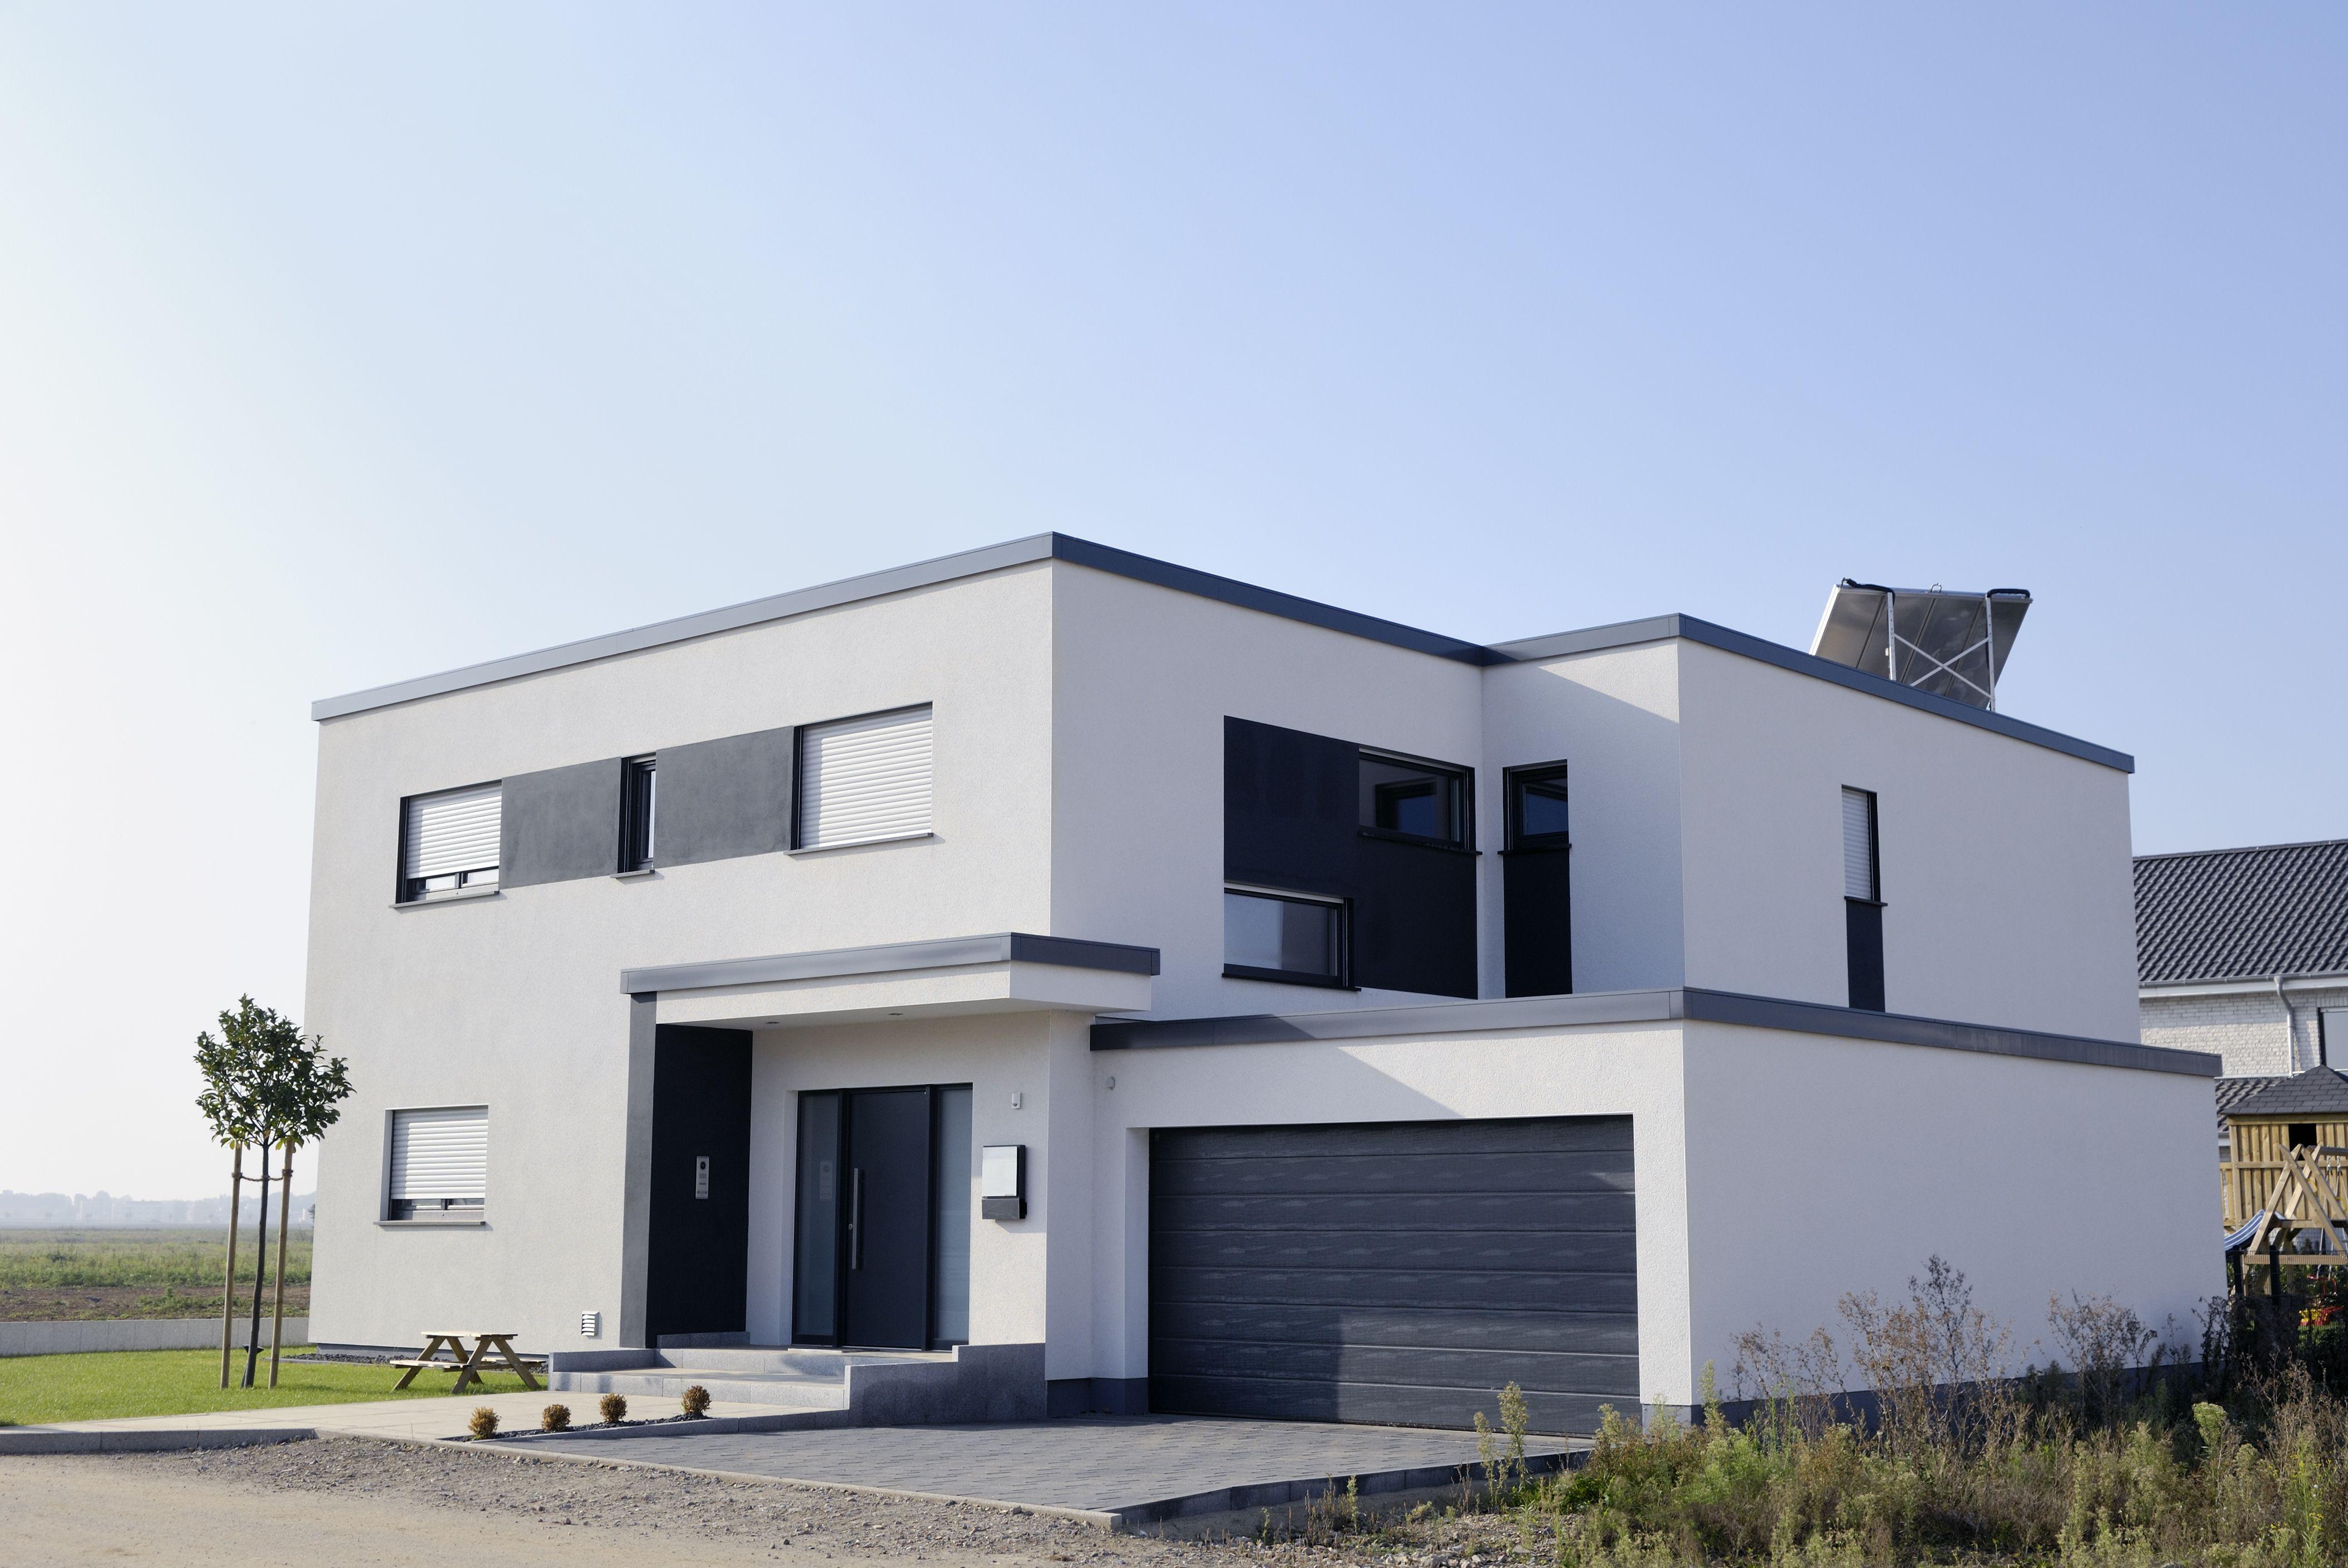 mieten bauhaus beautiful tiny houses auf dem bauhaus. Black Bedroom Furniture Sets. Home Design Ideas